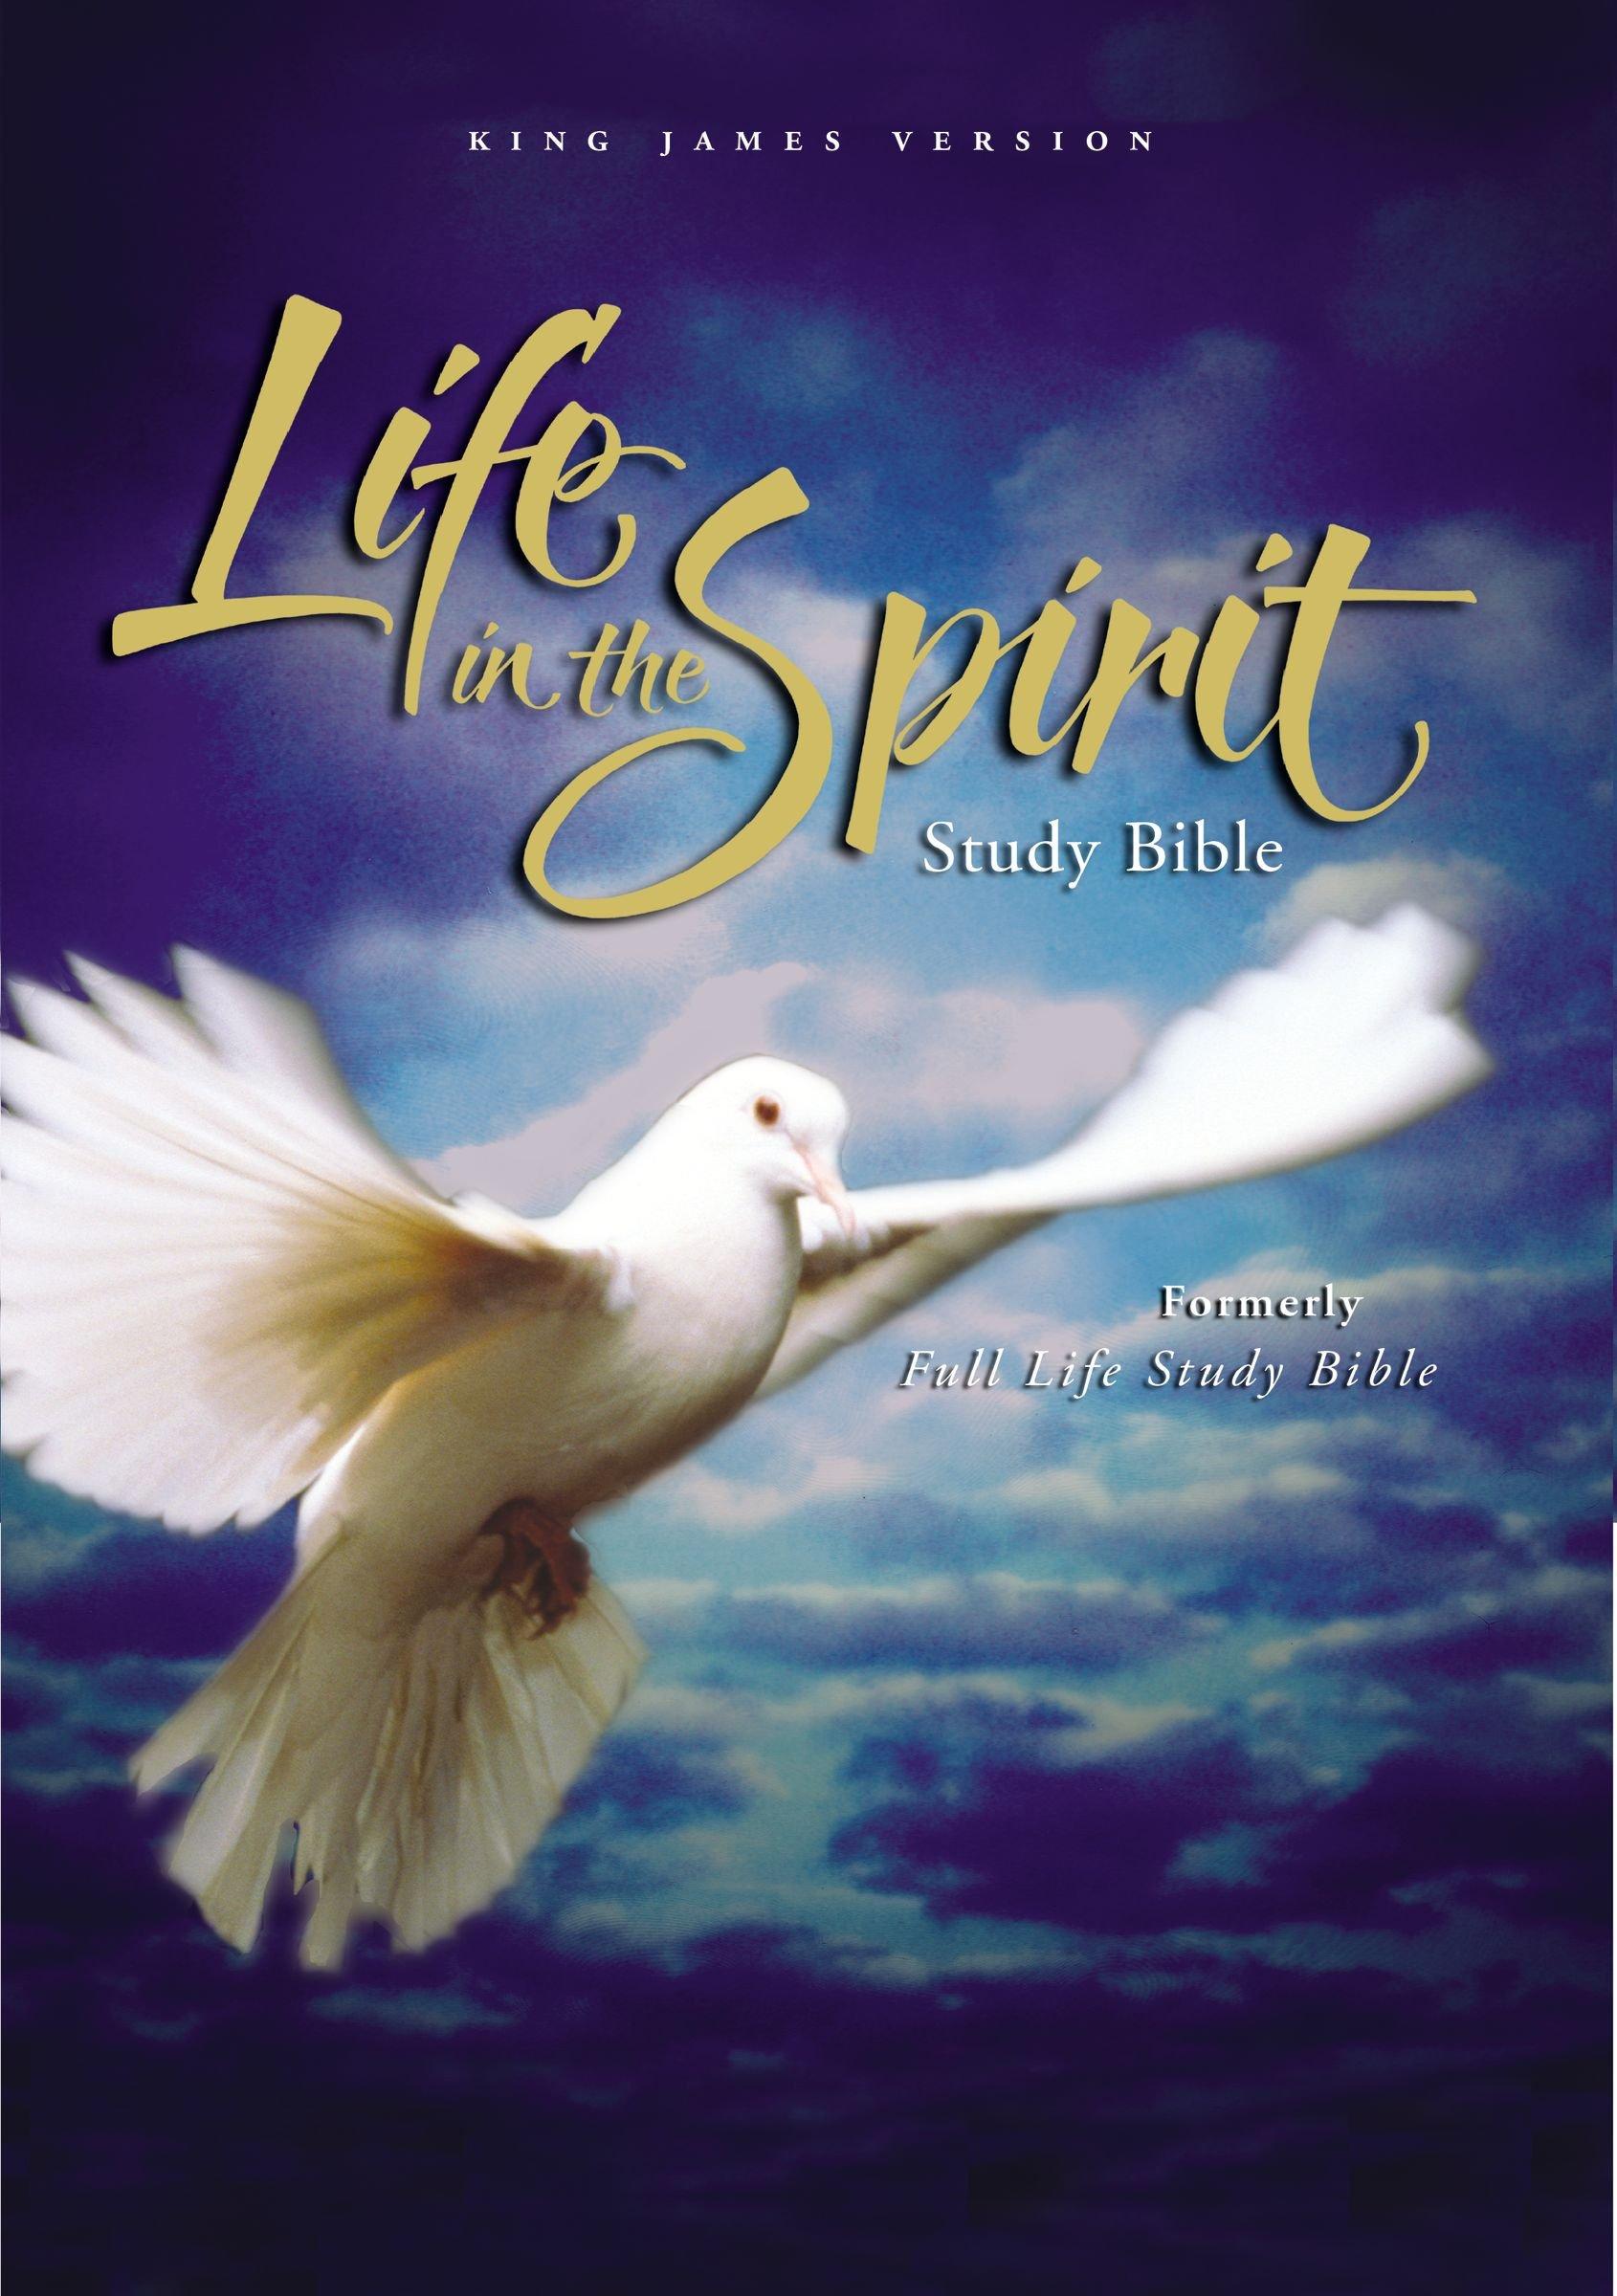 Download KJV Life in the Spirit Study Bible ebook